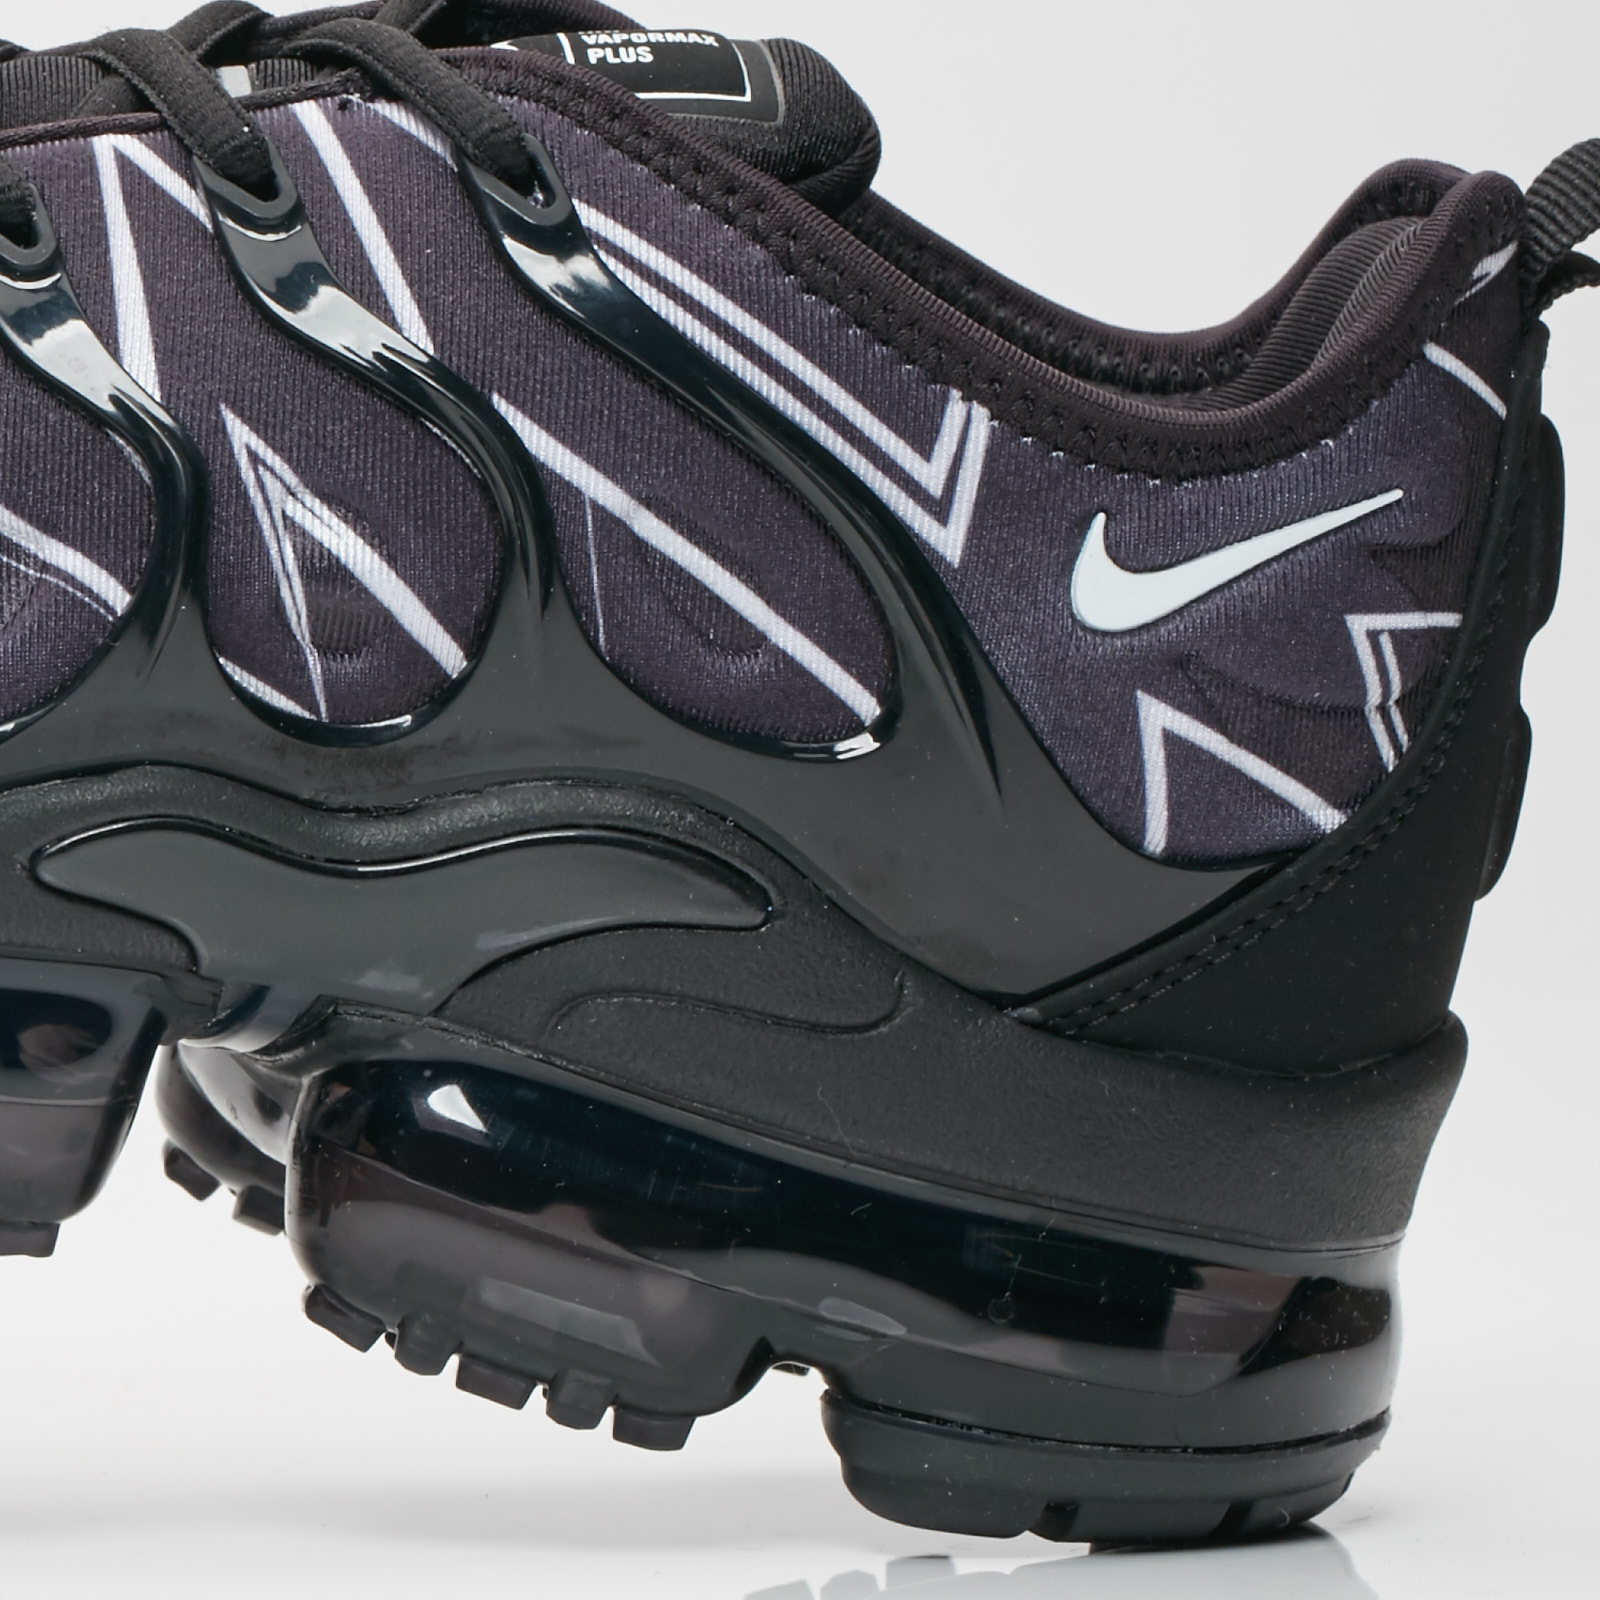 093b9170d8422 Nike Air Vapormax Plus HL - Aj6312-001 - Sneakersnstuff